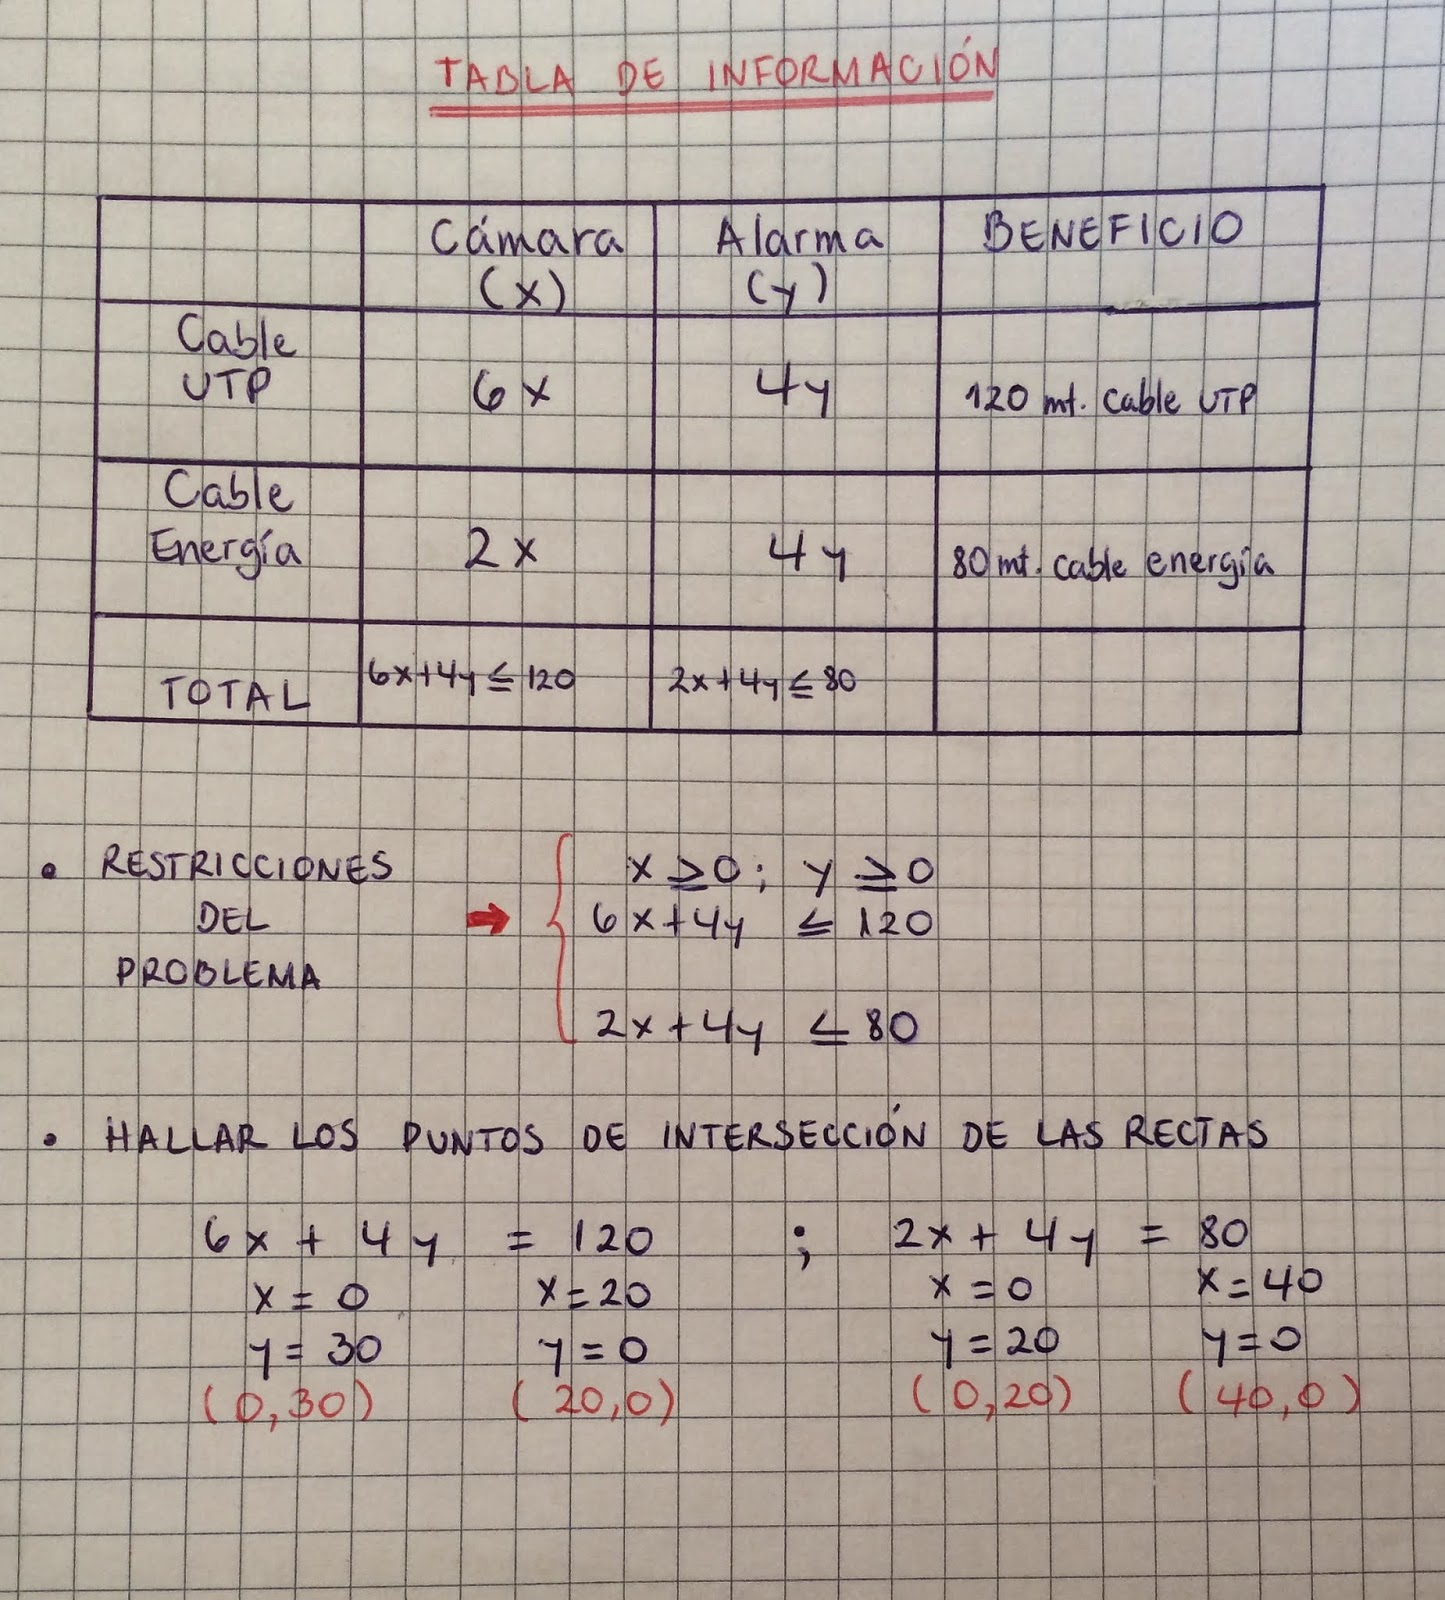 Circuito Lineal : Ejercicios de programación lineal circuitos lógicos tablas de